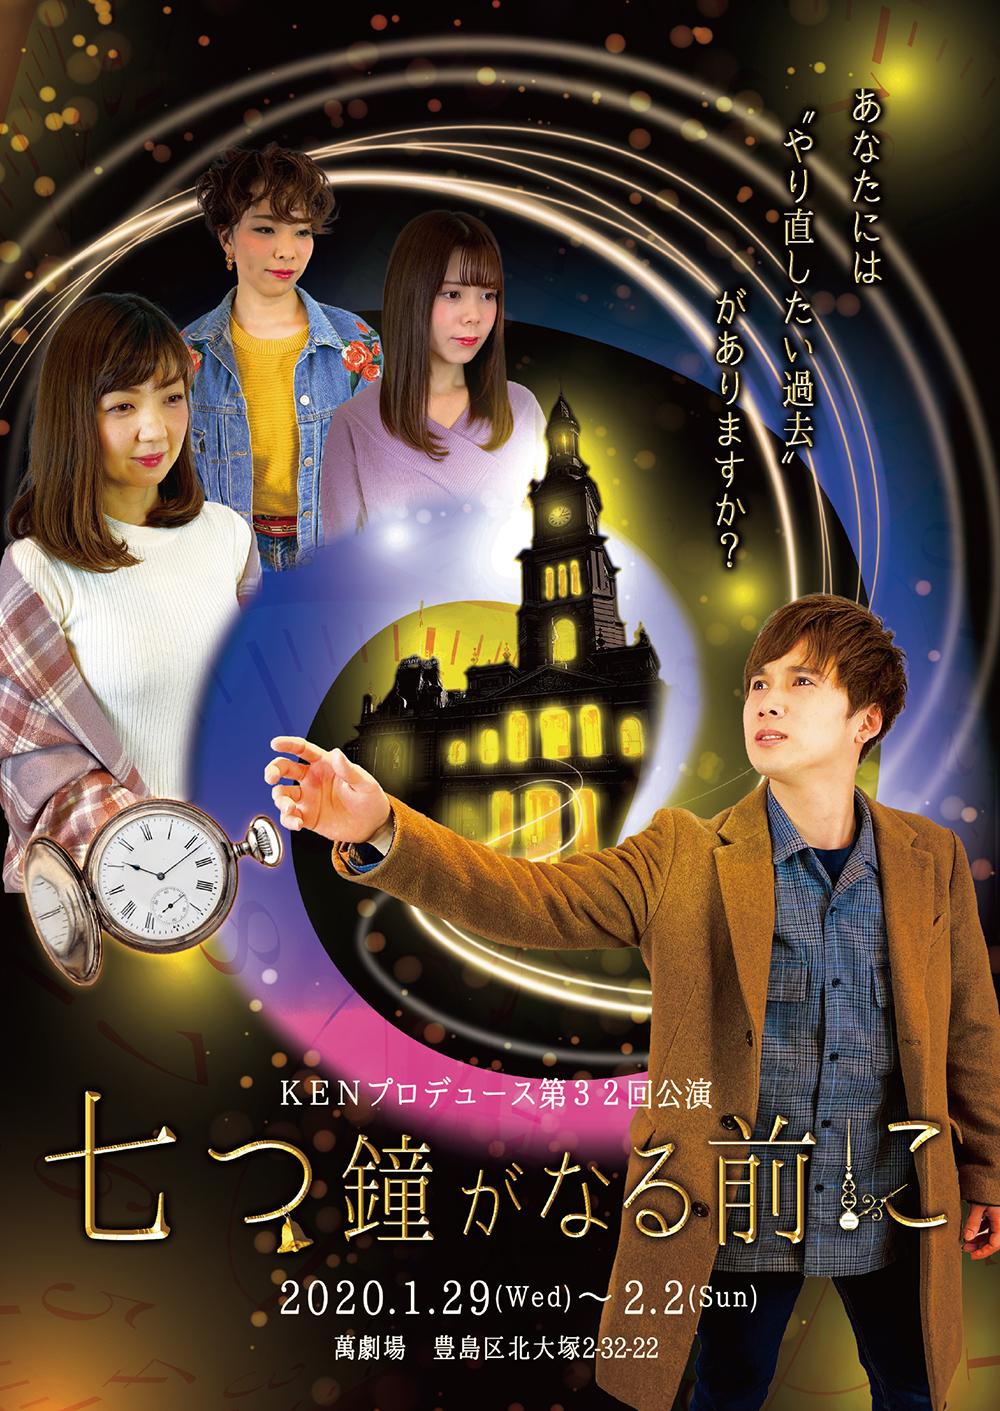 KENプロデュース第32回公演『七つ鐘が鳴る前に』 チームM DVD